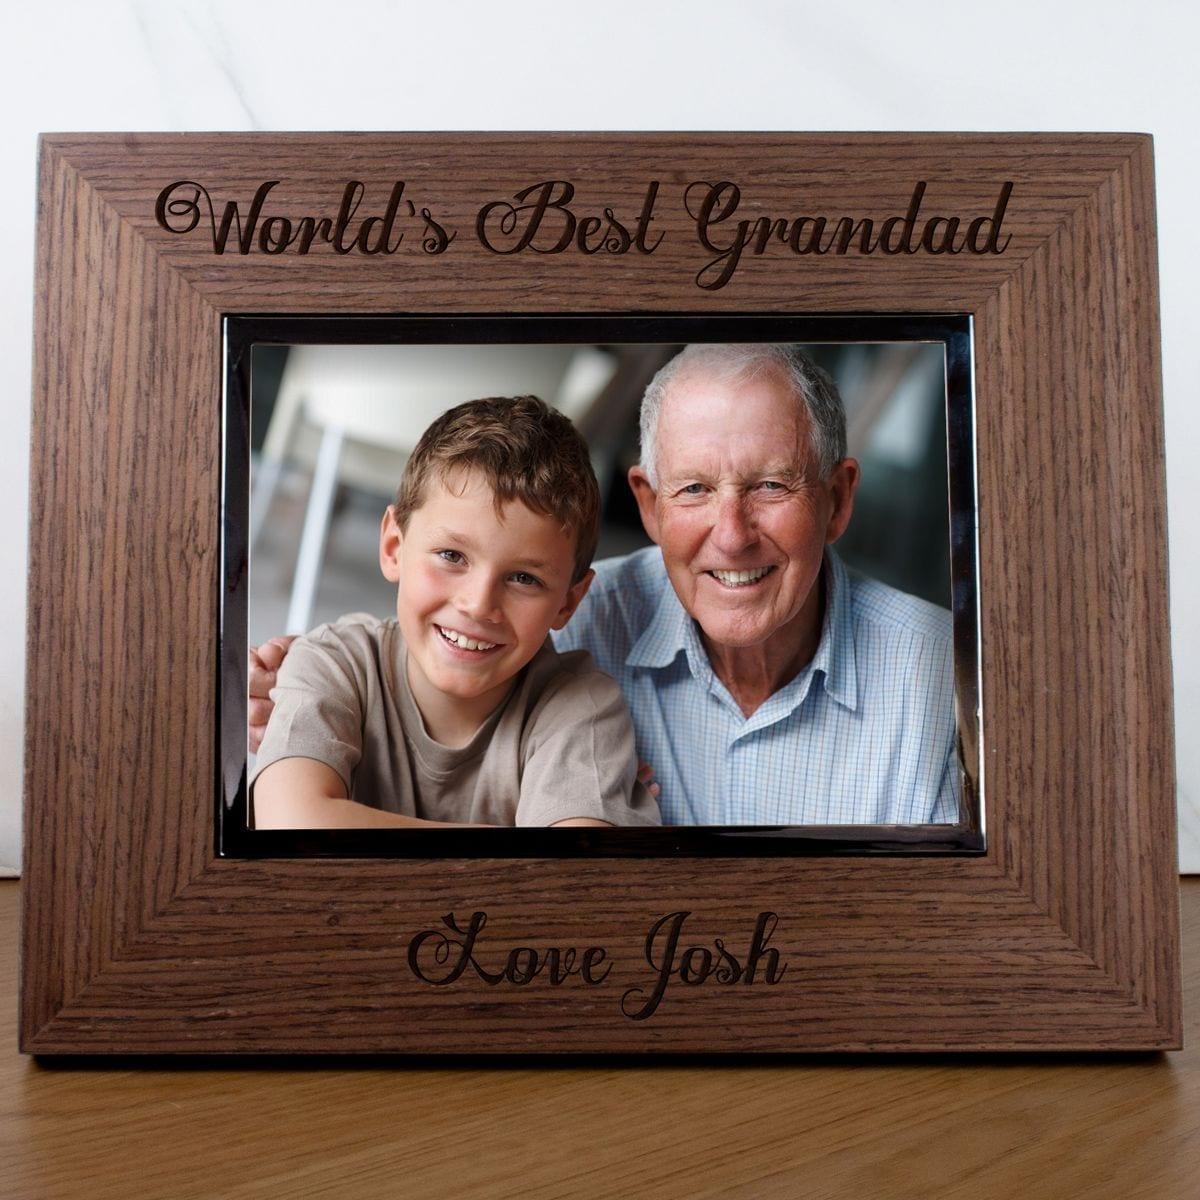 worlds-best-grandad-engraved-photo-frame-2740-p.jpg